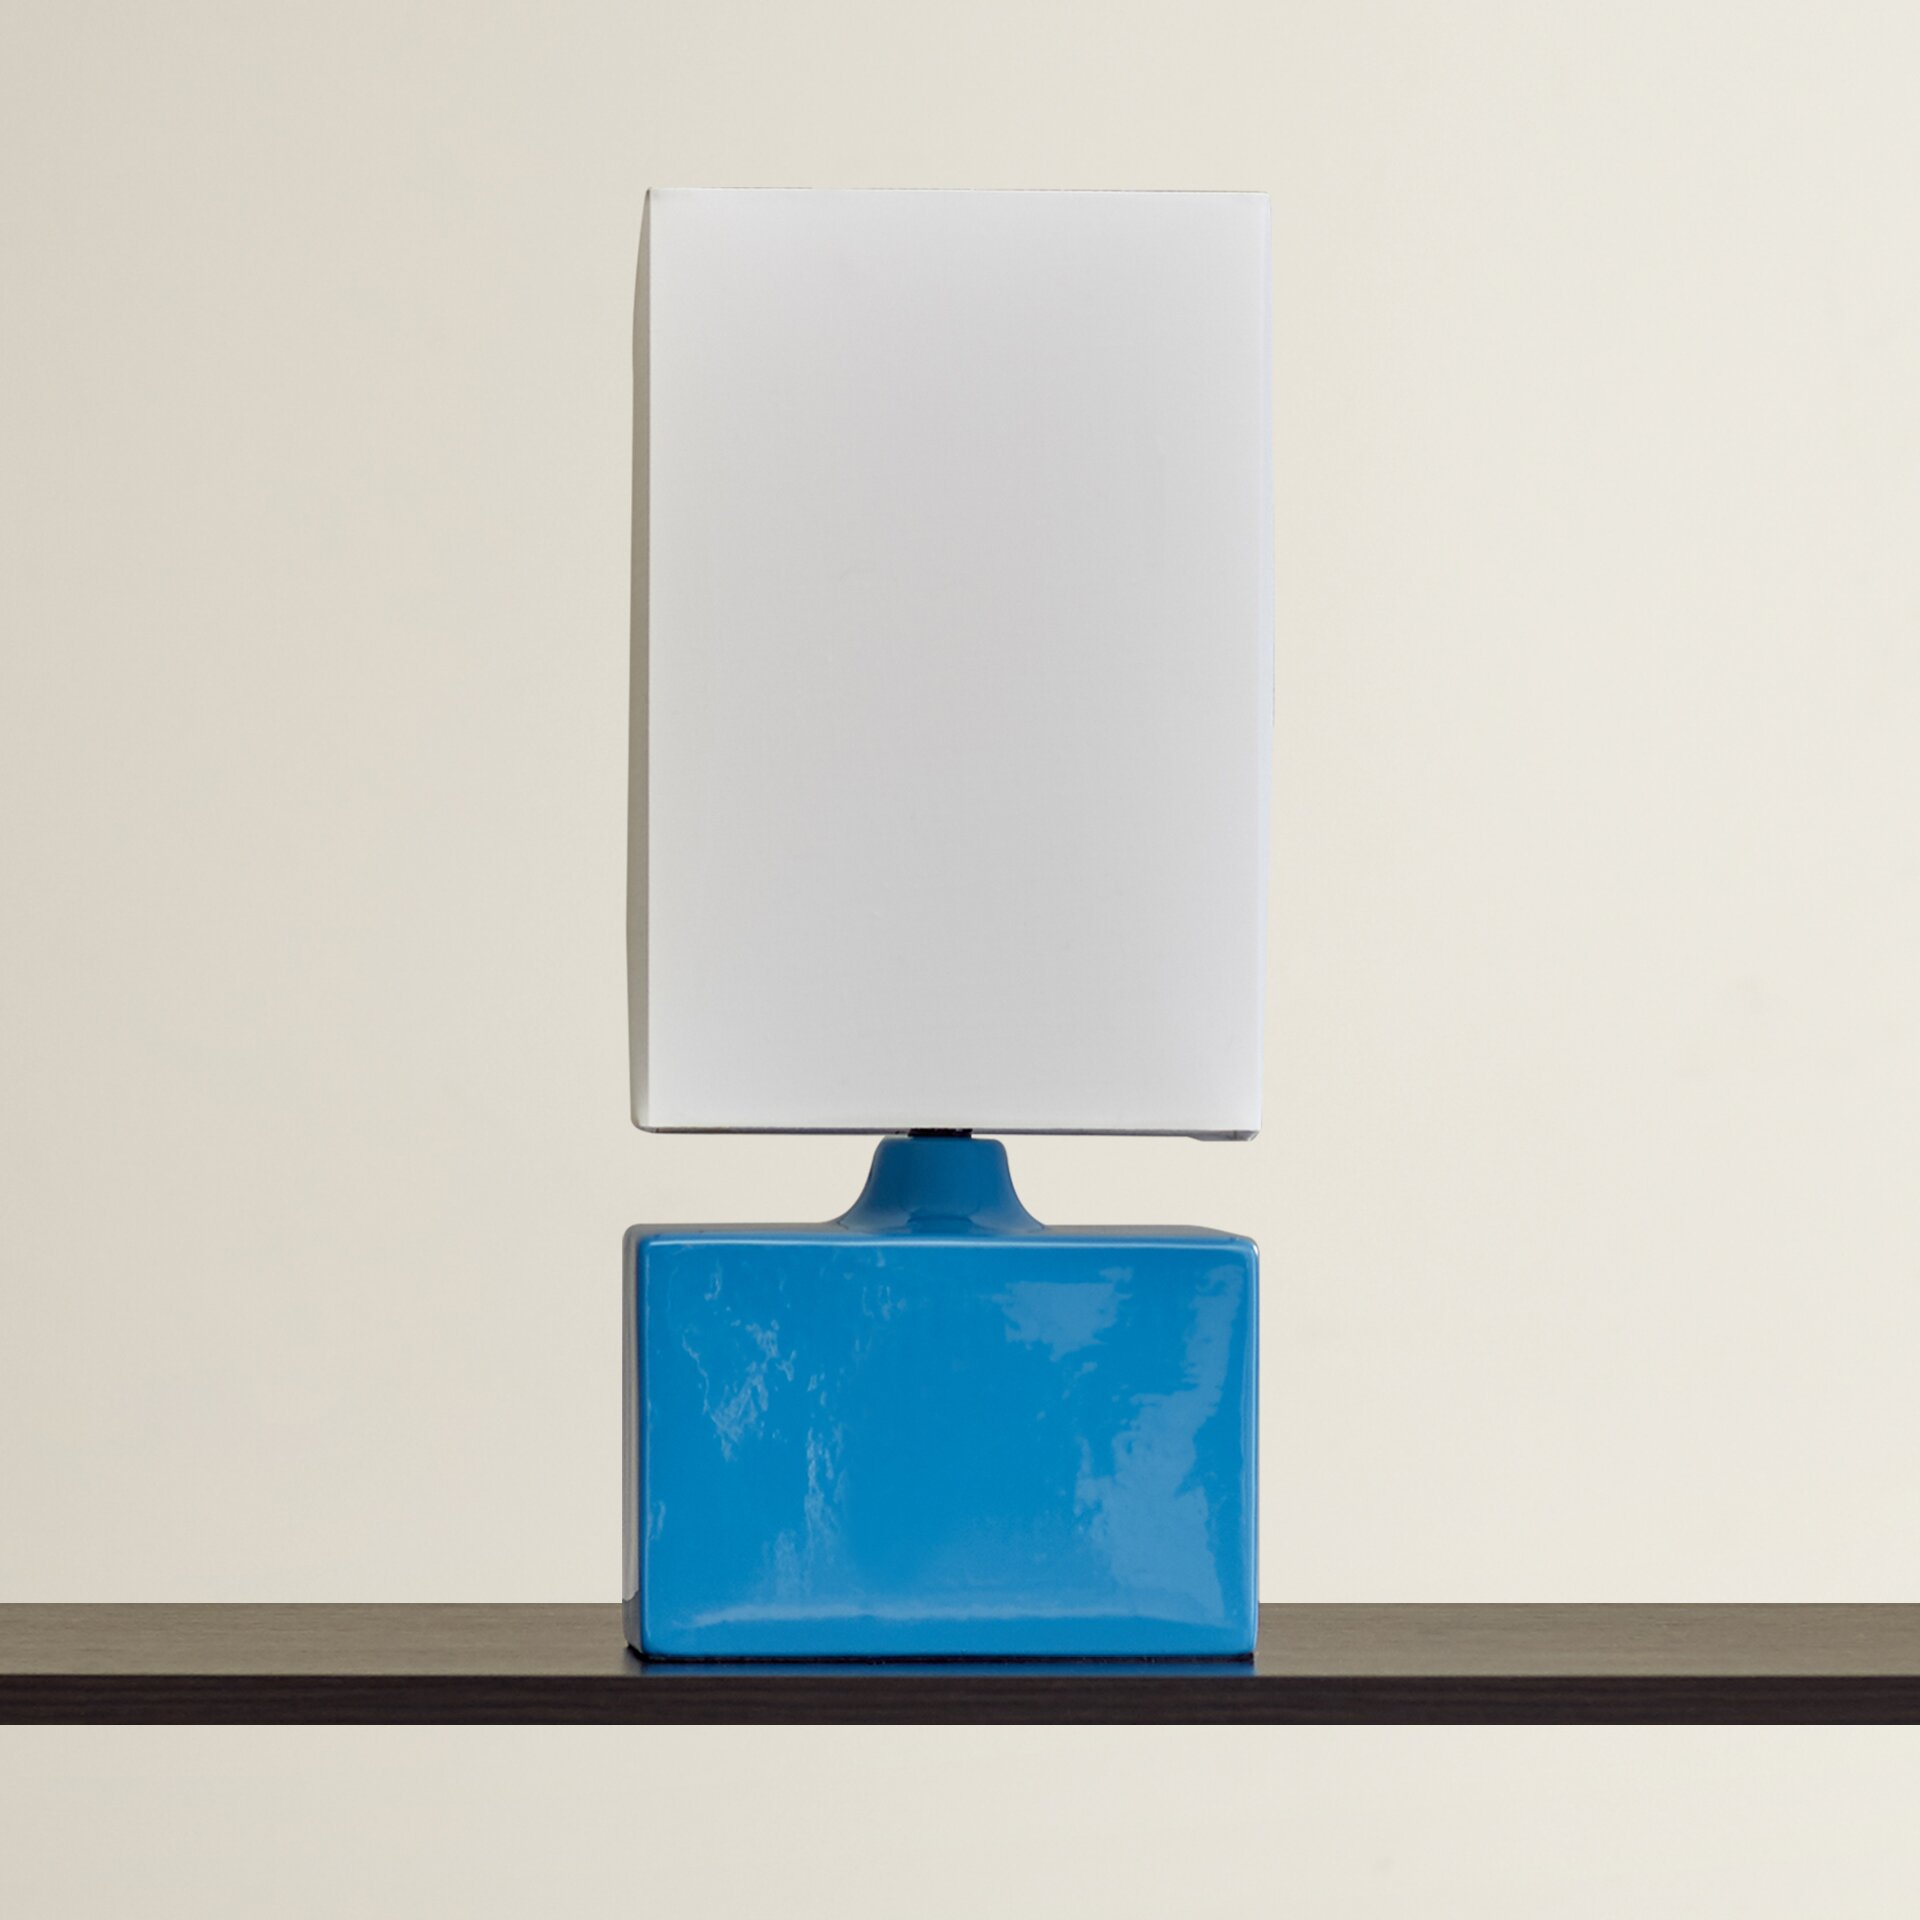 oliver 17 5 h table lamp with rectangular shade by viv rae. Black Bedroom Furniture Sets. Home Design Ideas